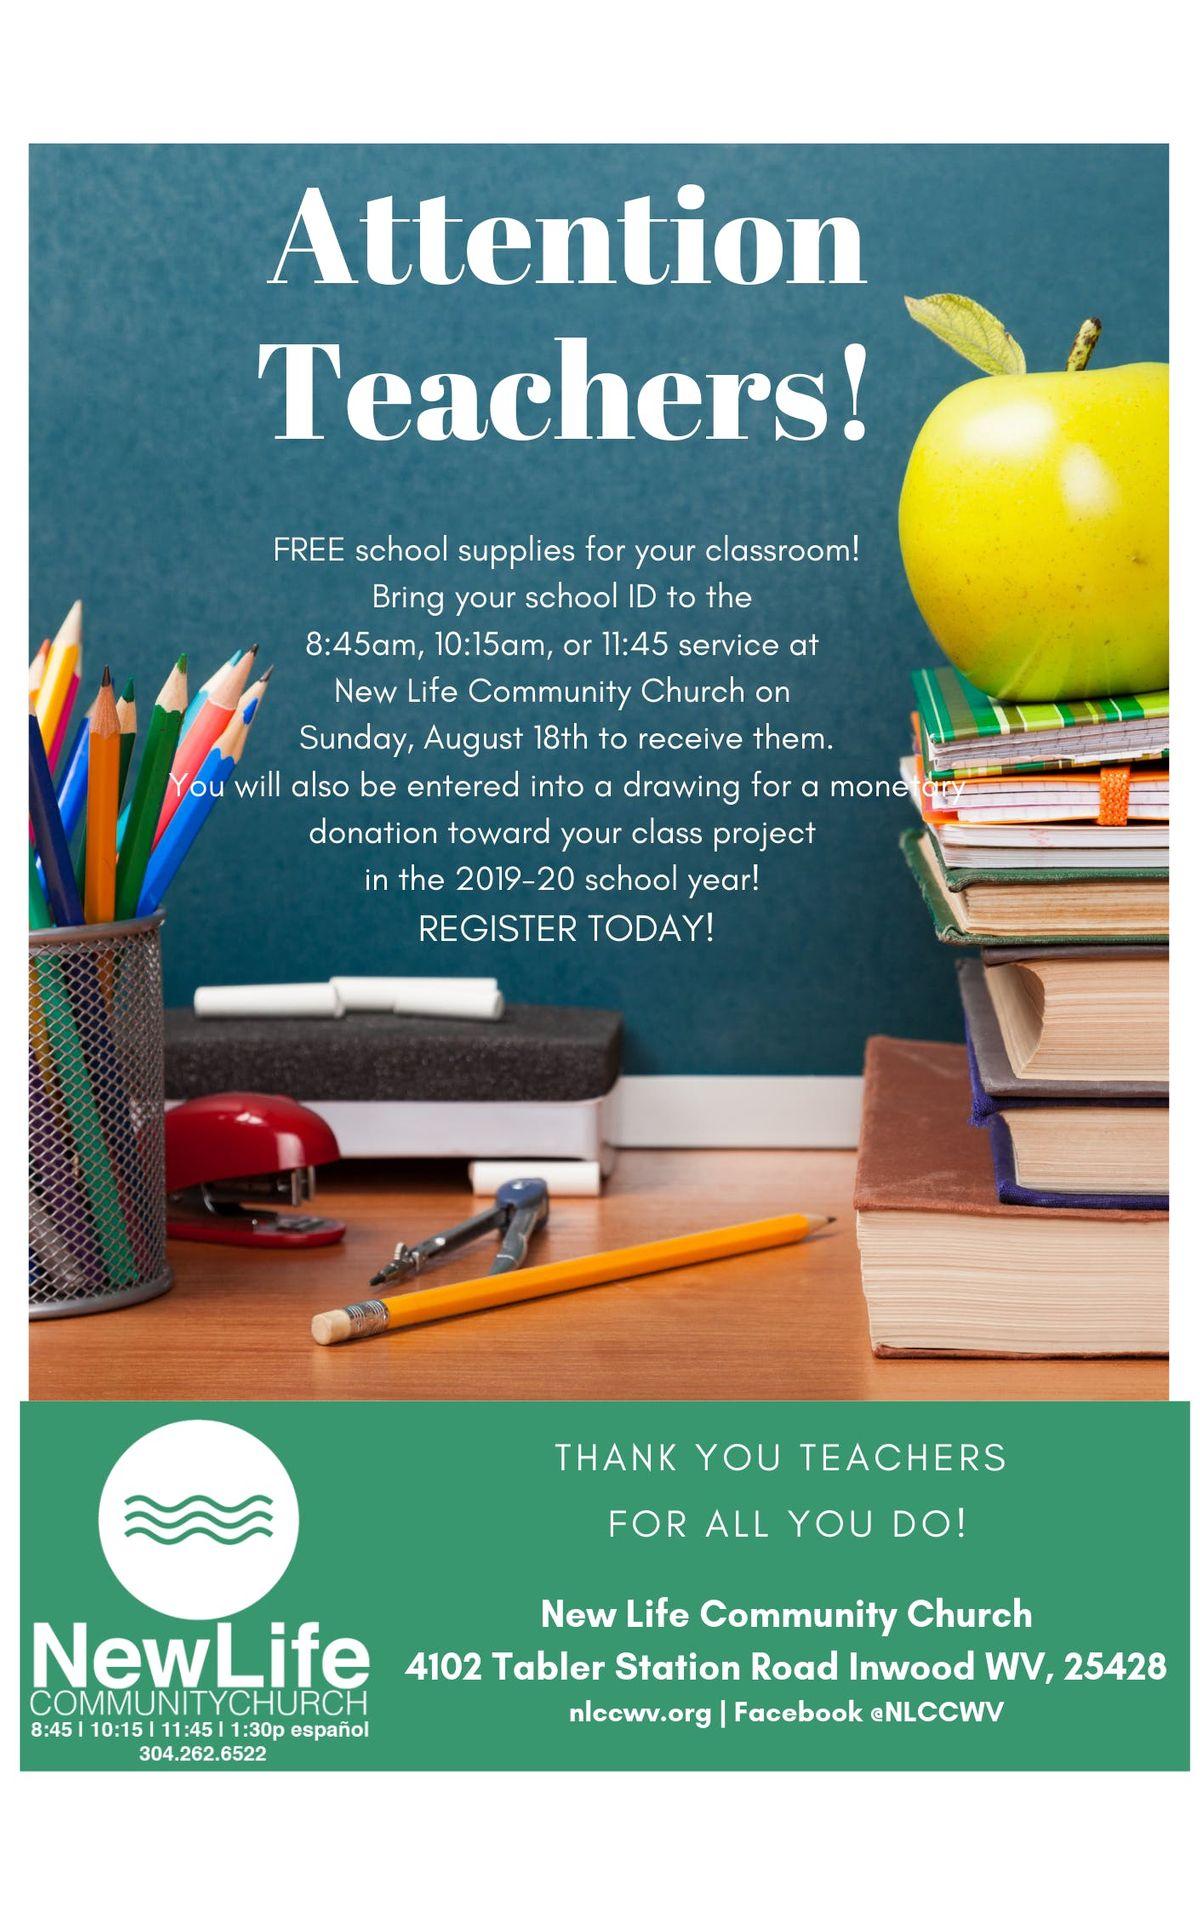 Teachers Appreciation Sunday - Free School Supplies! at New